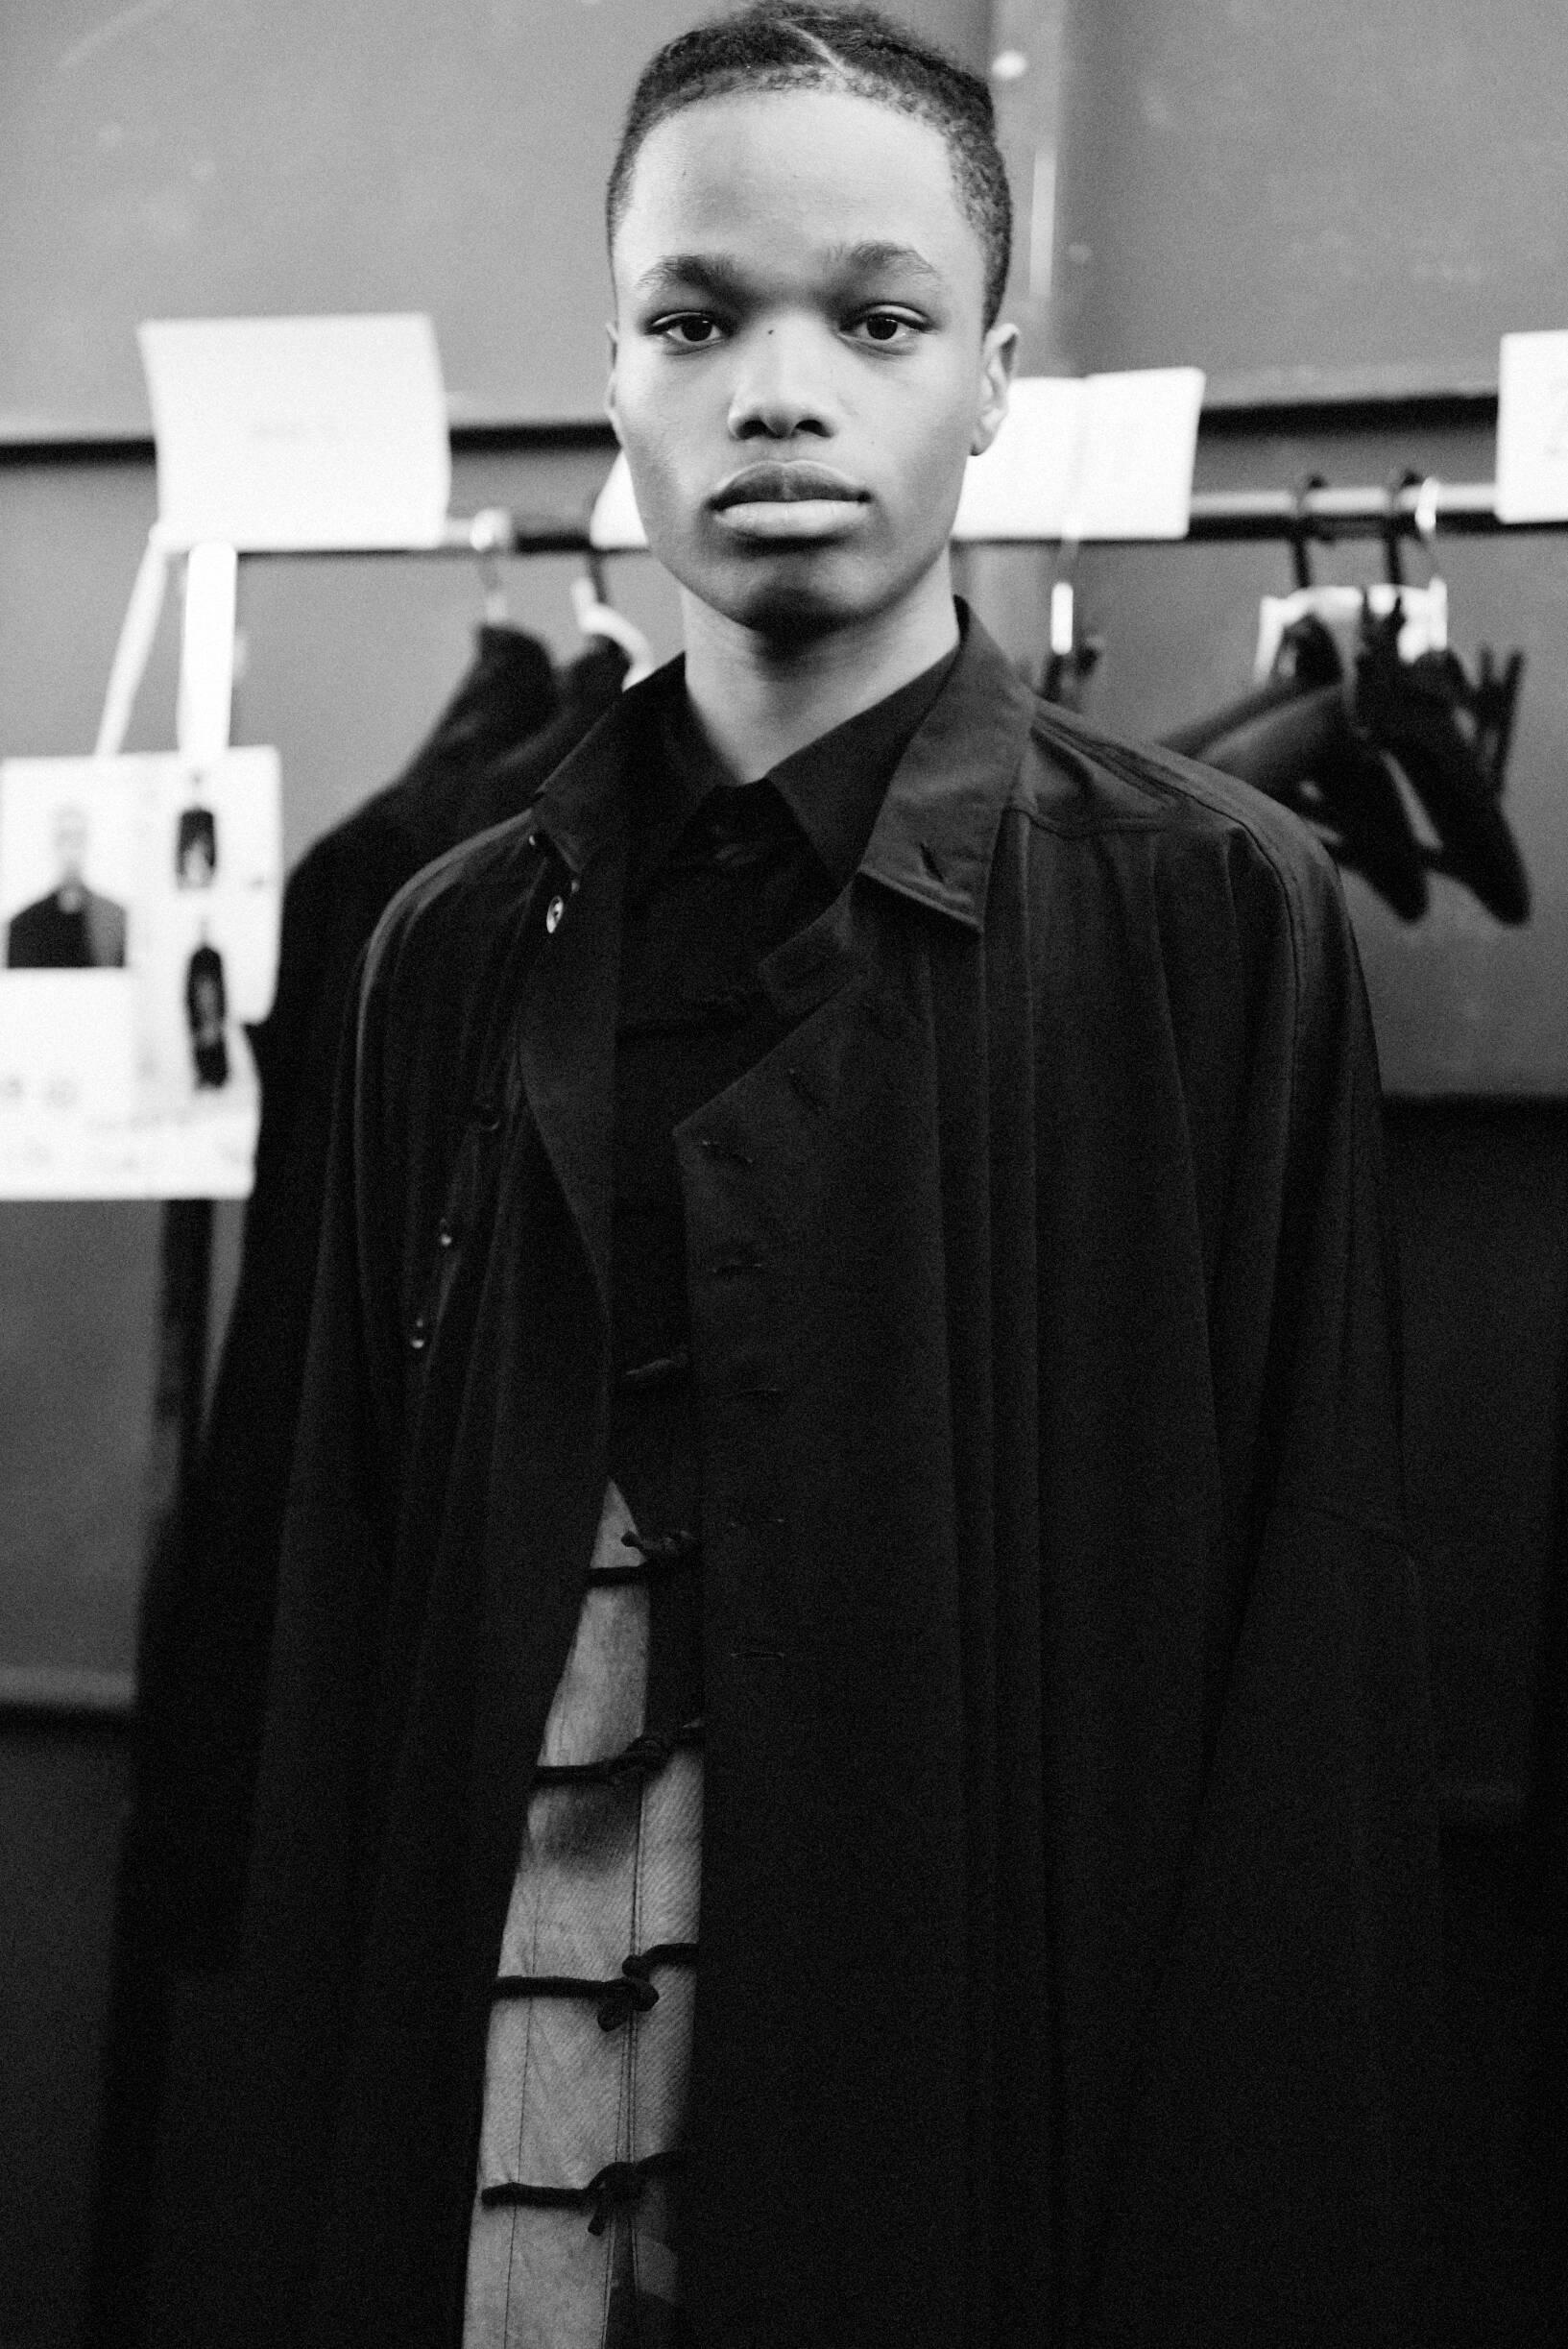 Backstage Yohji Yamamoto Model 2020